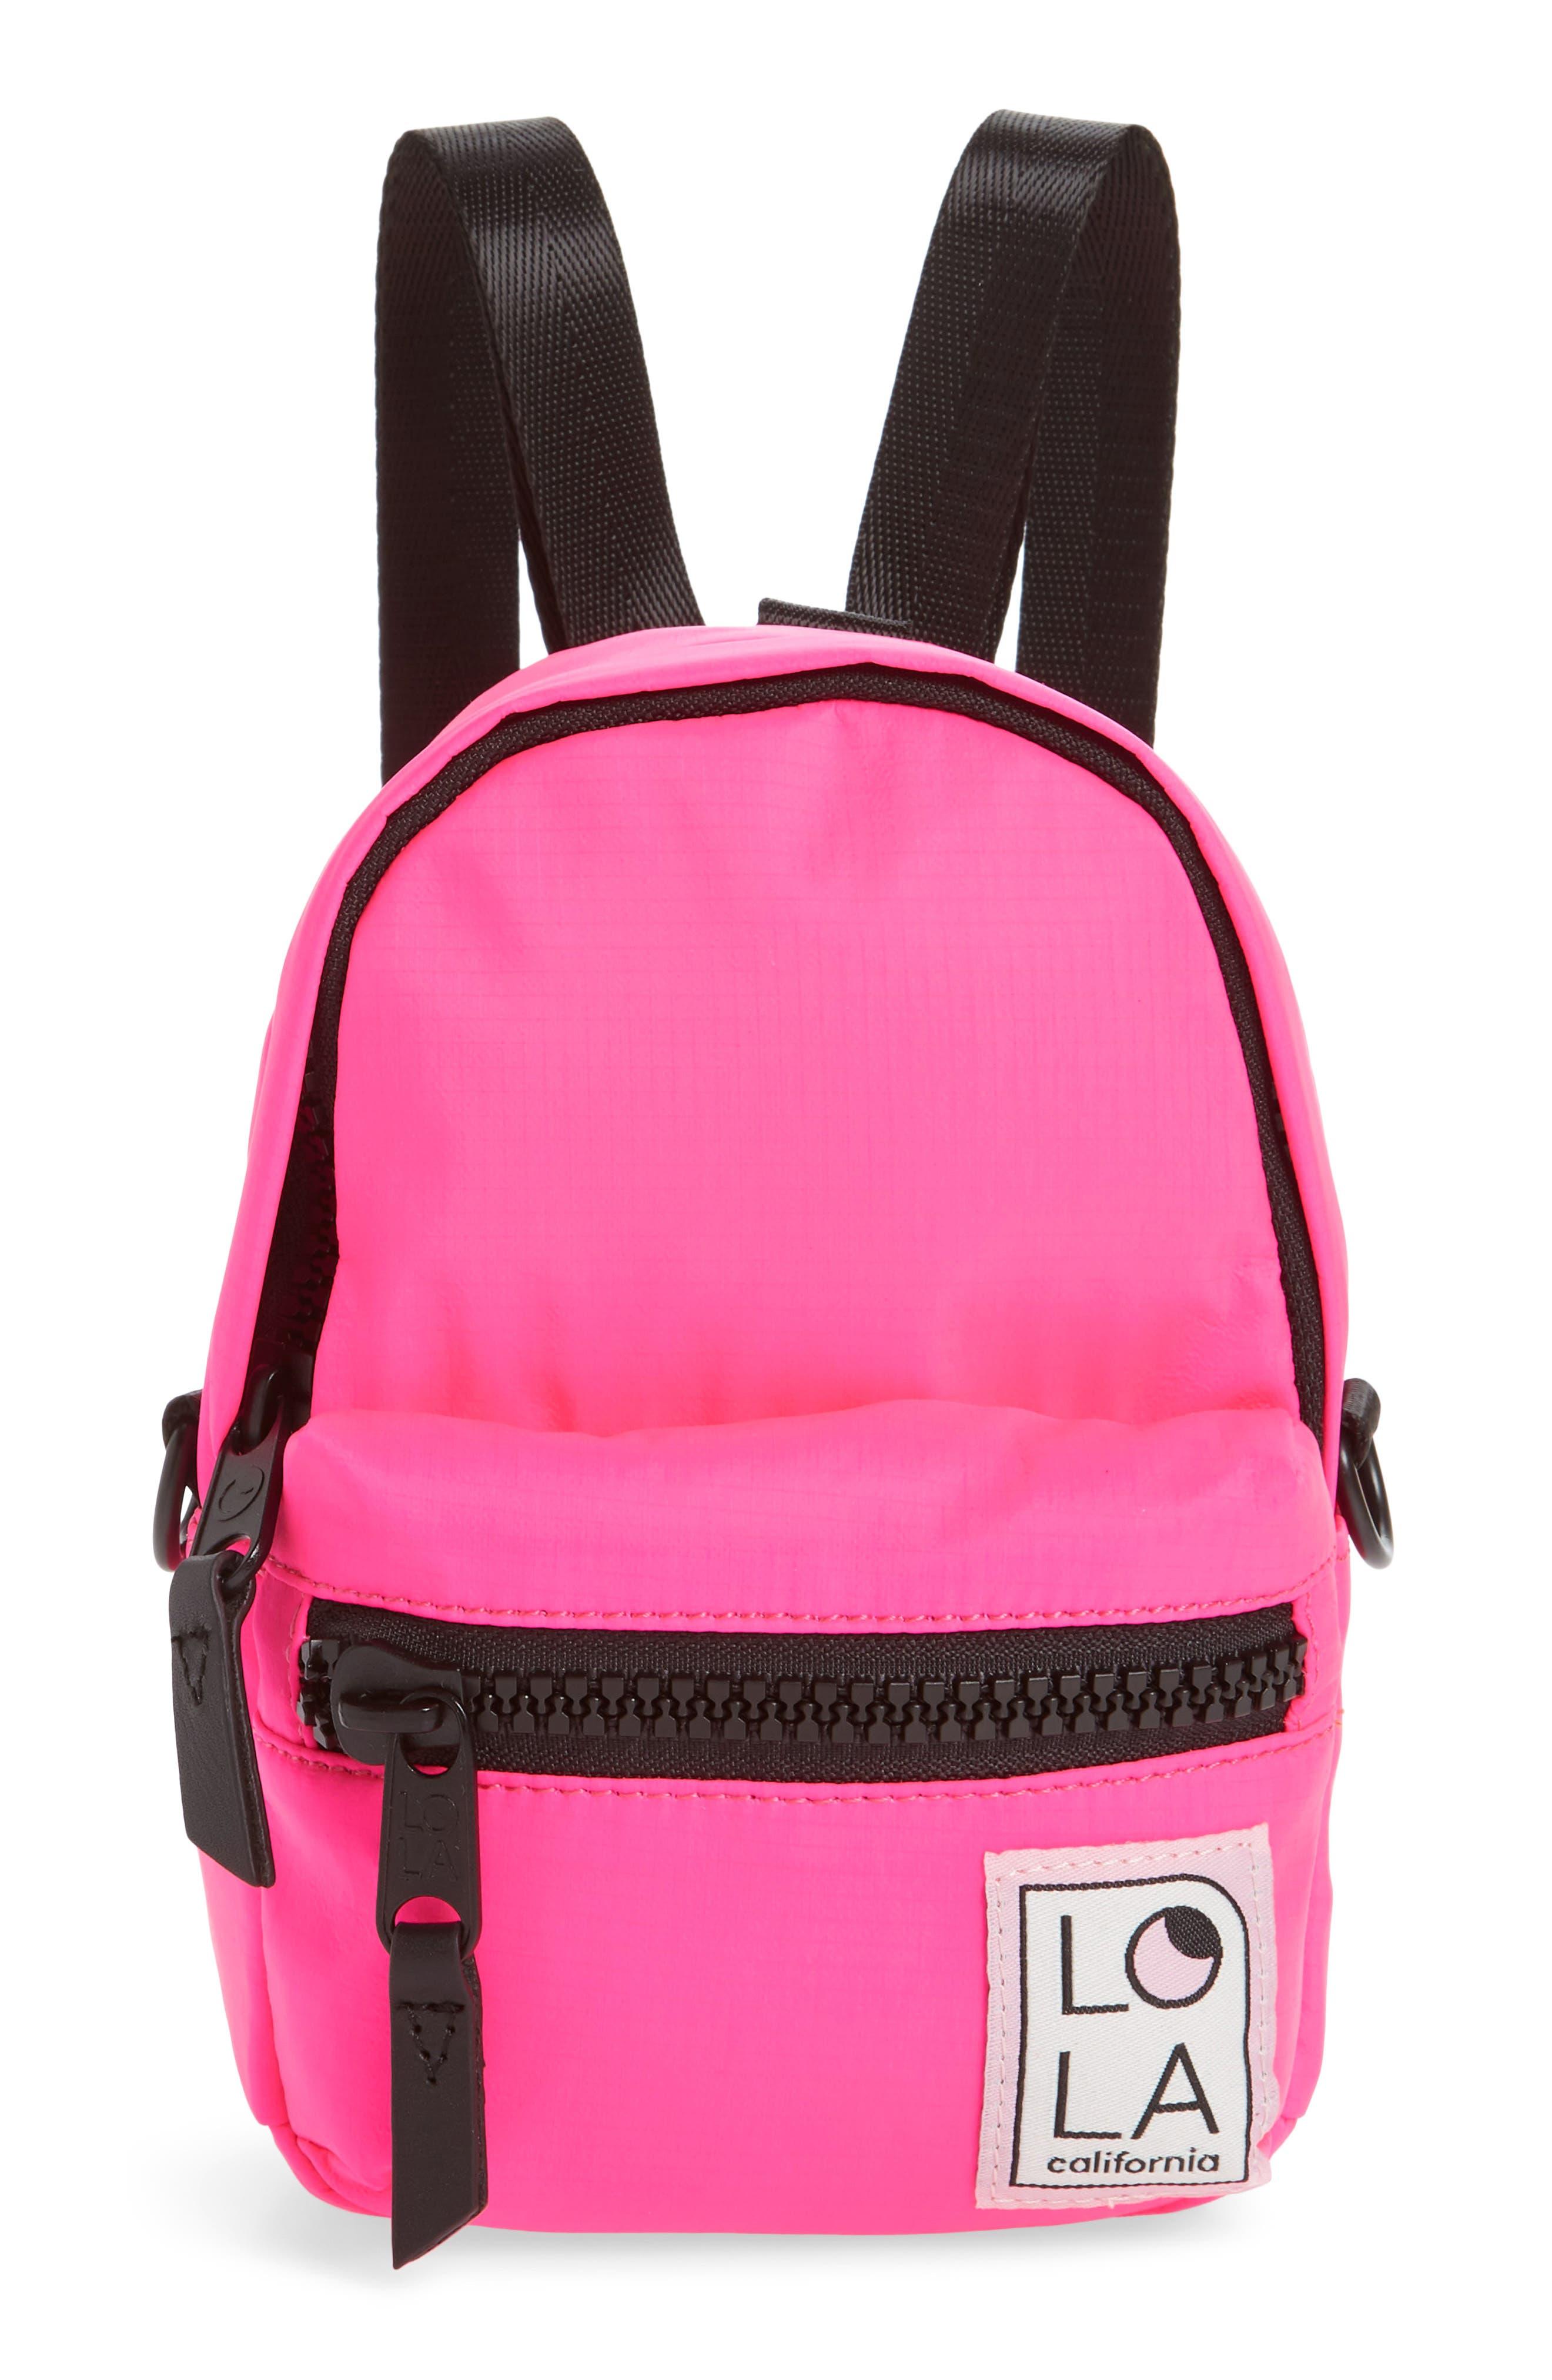 Lola Los Angeles Stargazer Mini Convertible Backpack - Pink